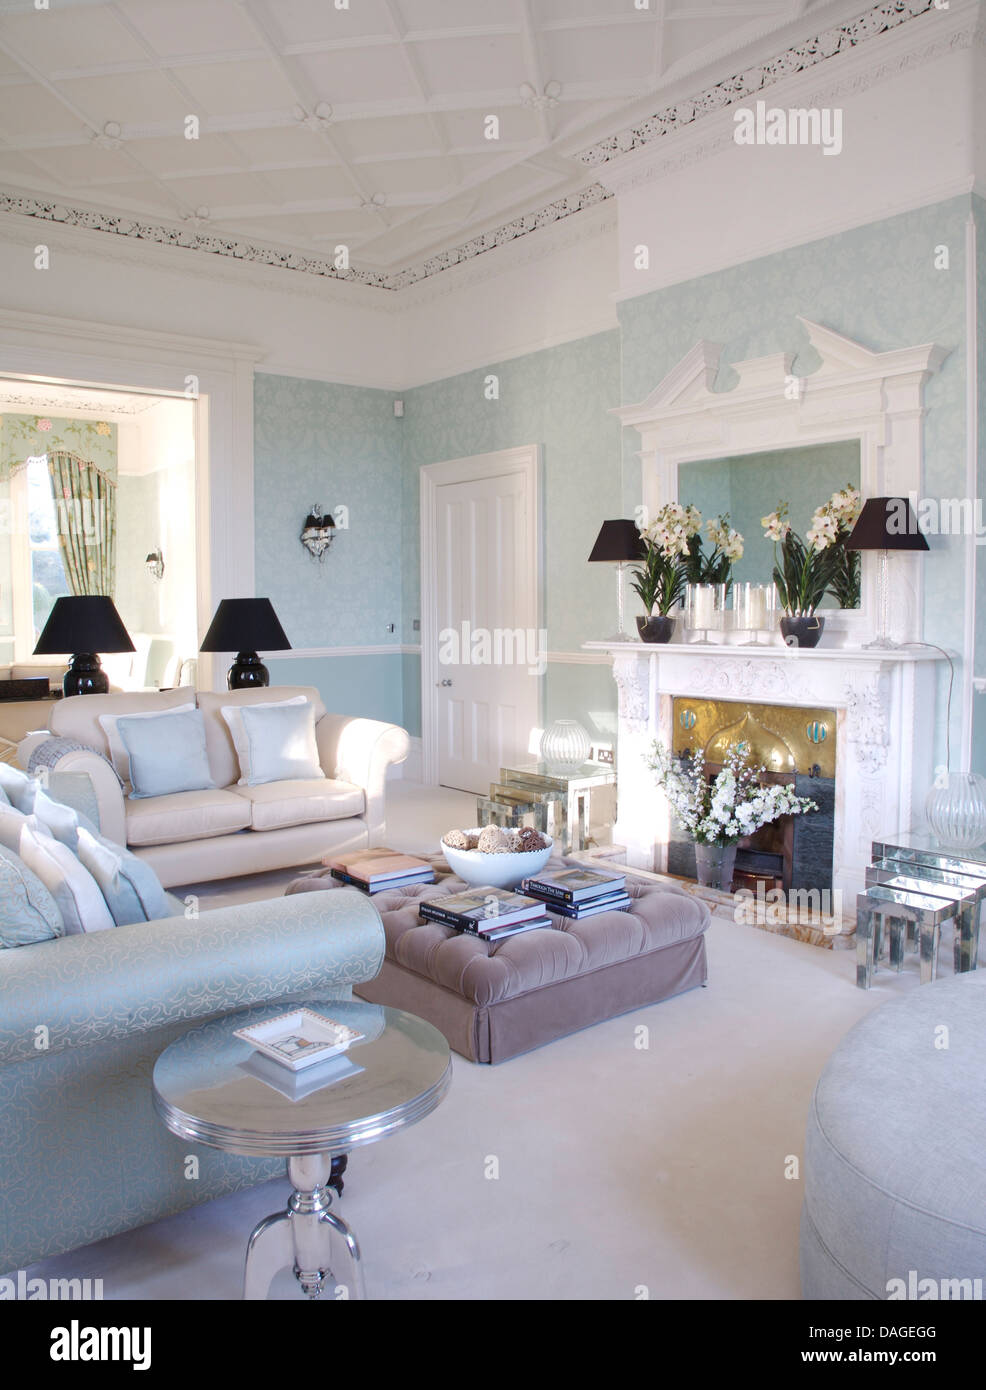 White And Pale Blue Sofas Around Gray Velvet Ottoman In